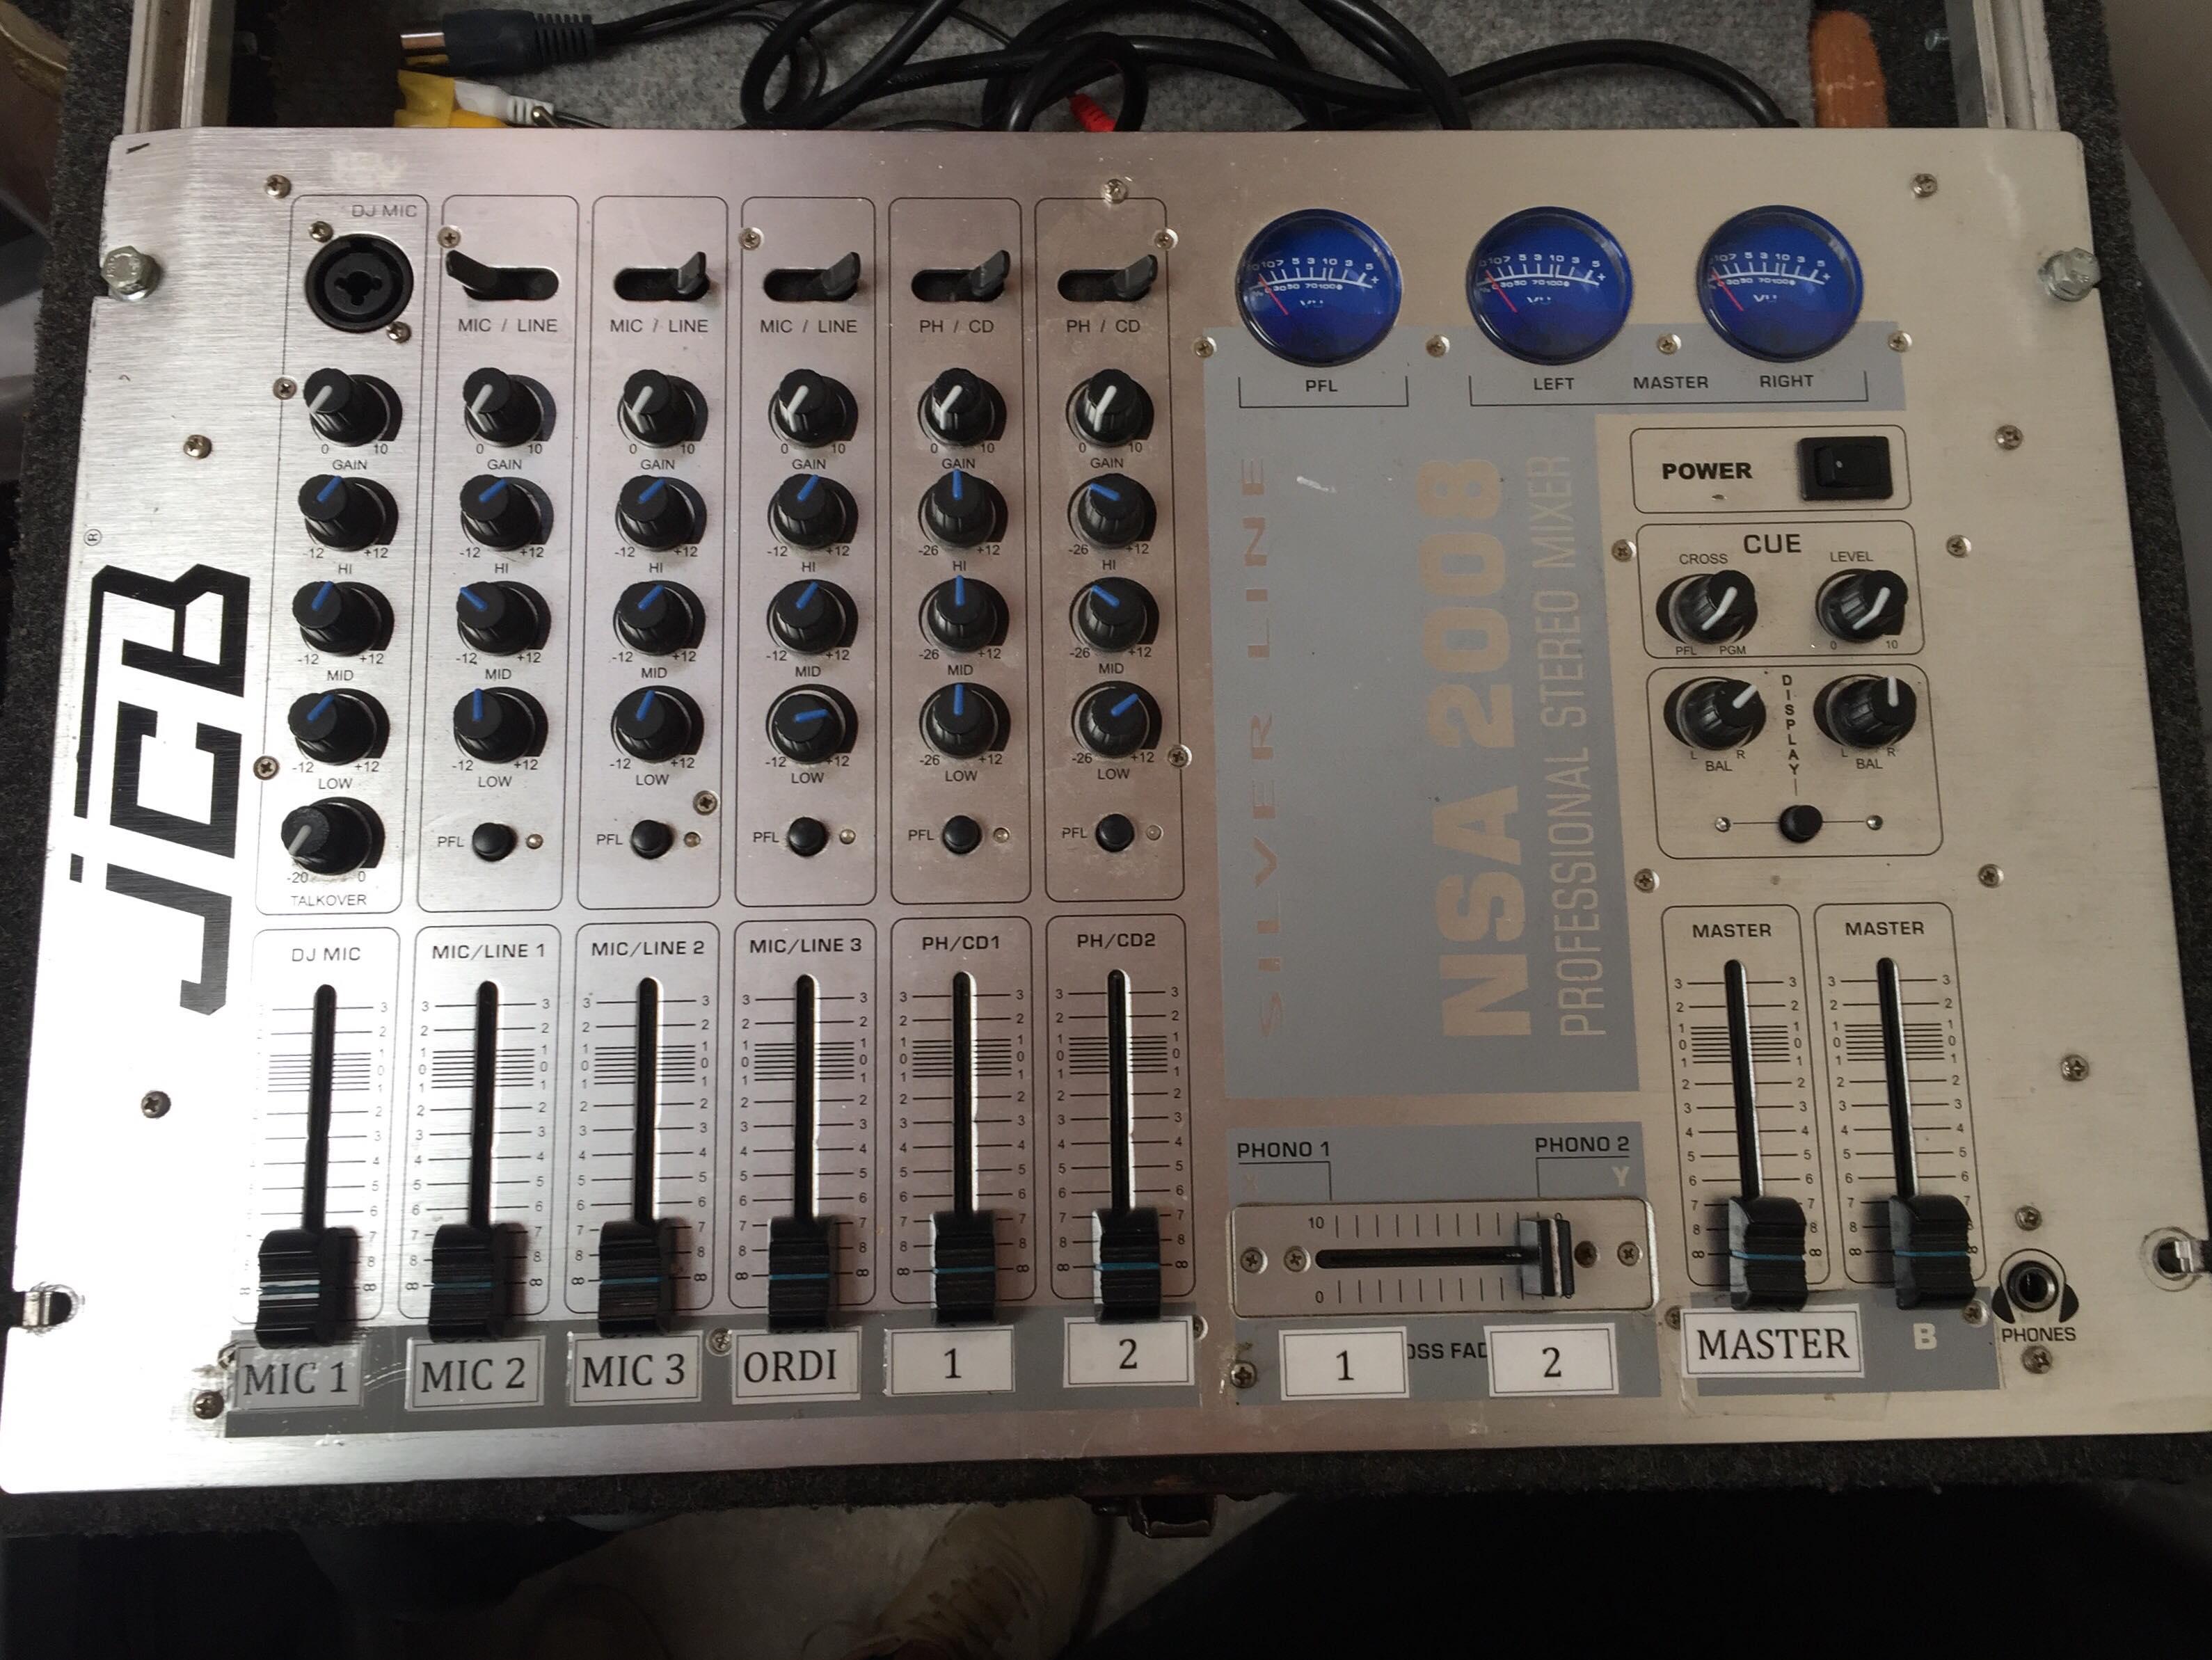 table de mixage jcb nsa 2010